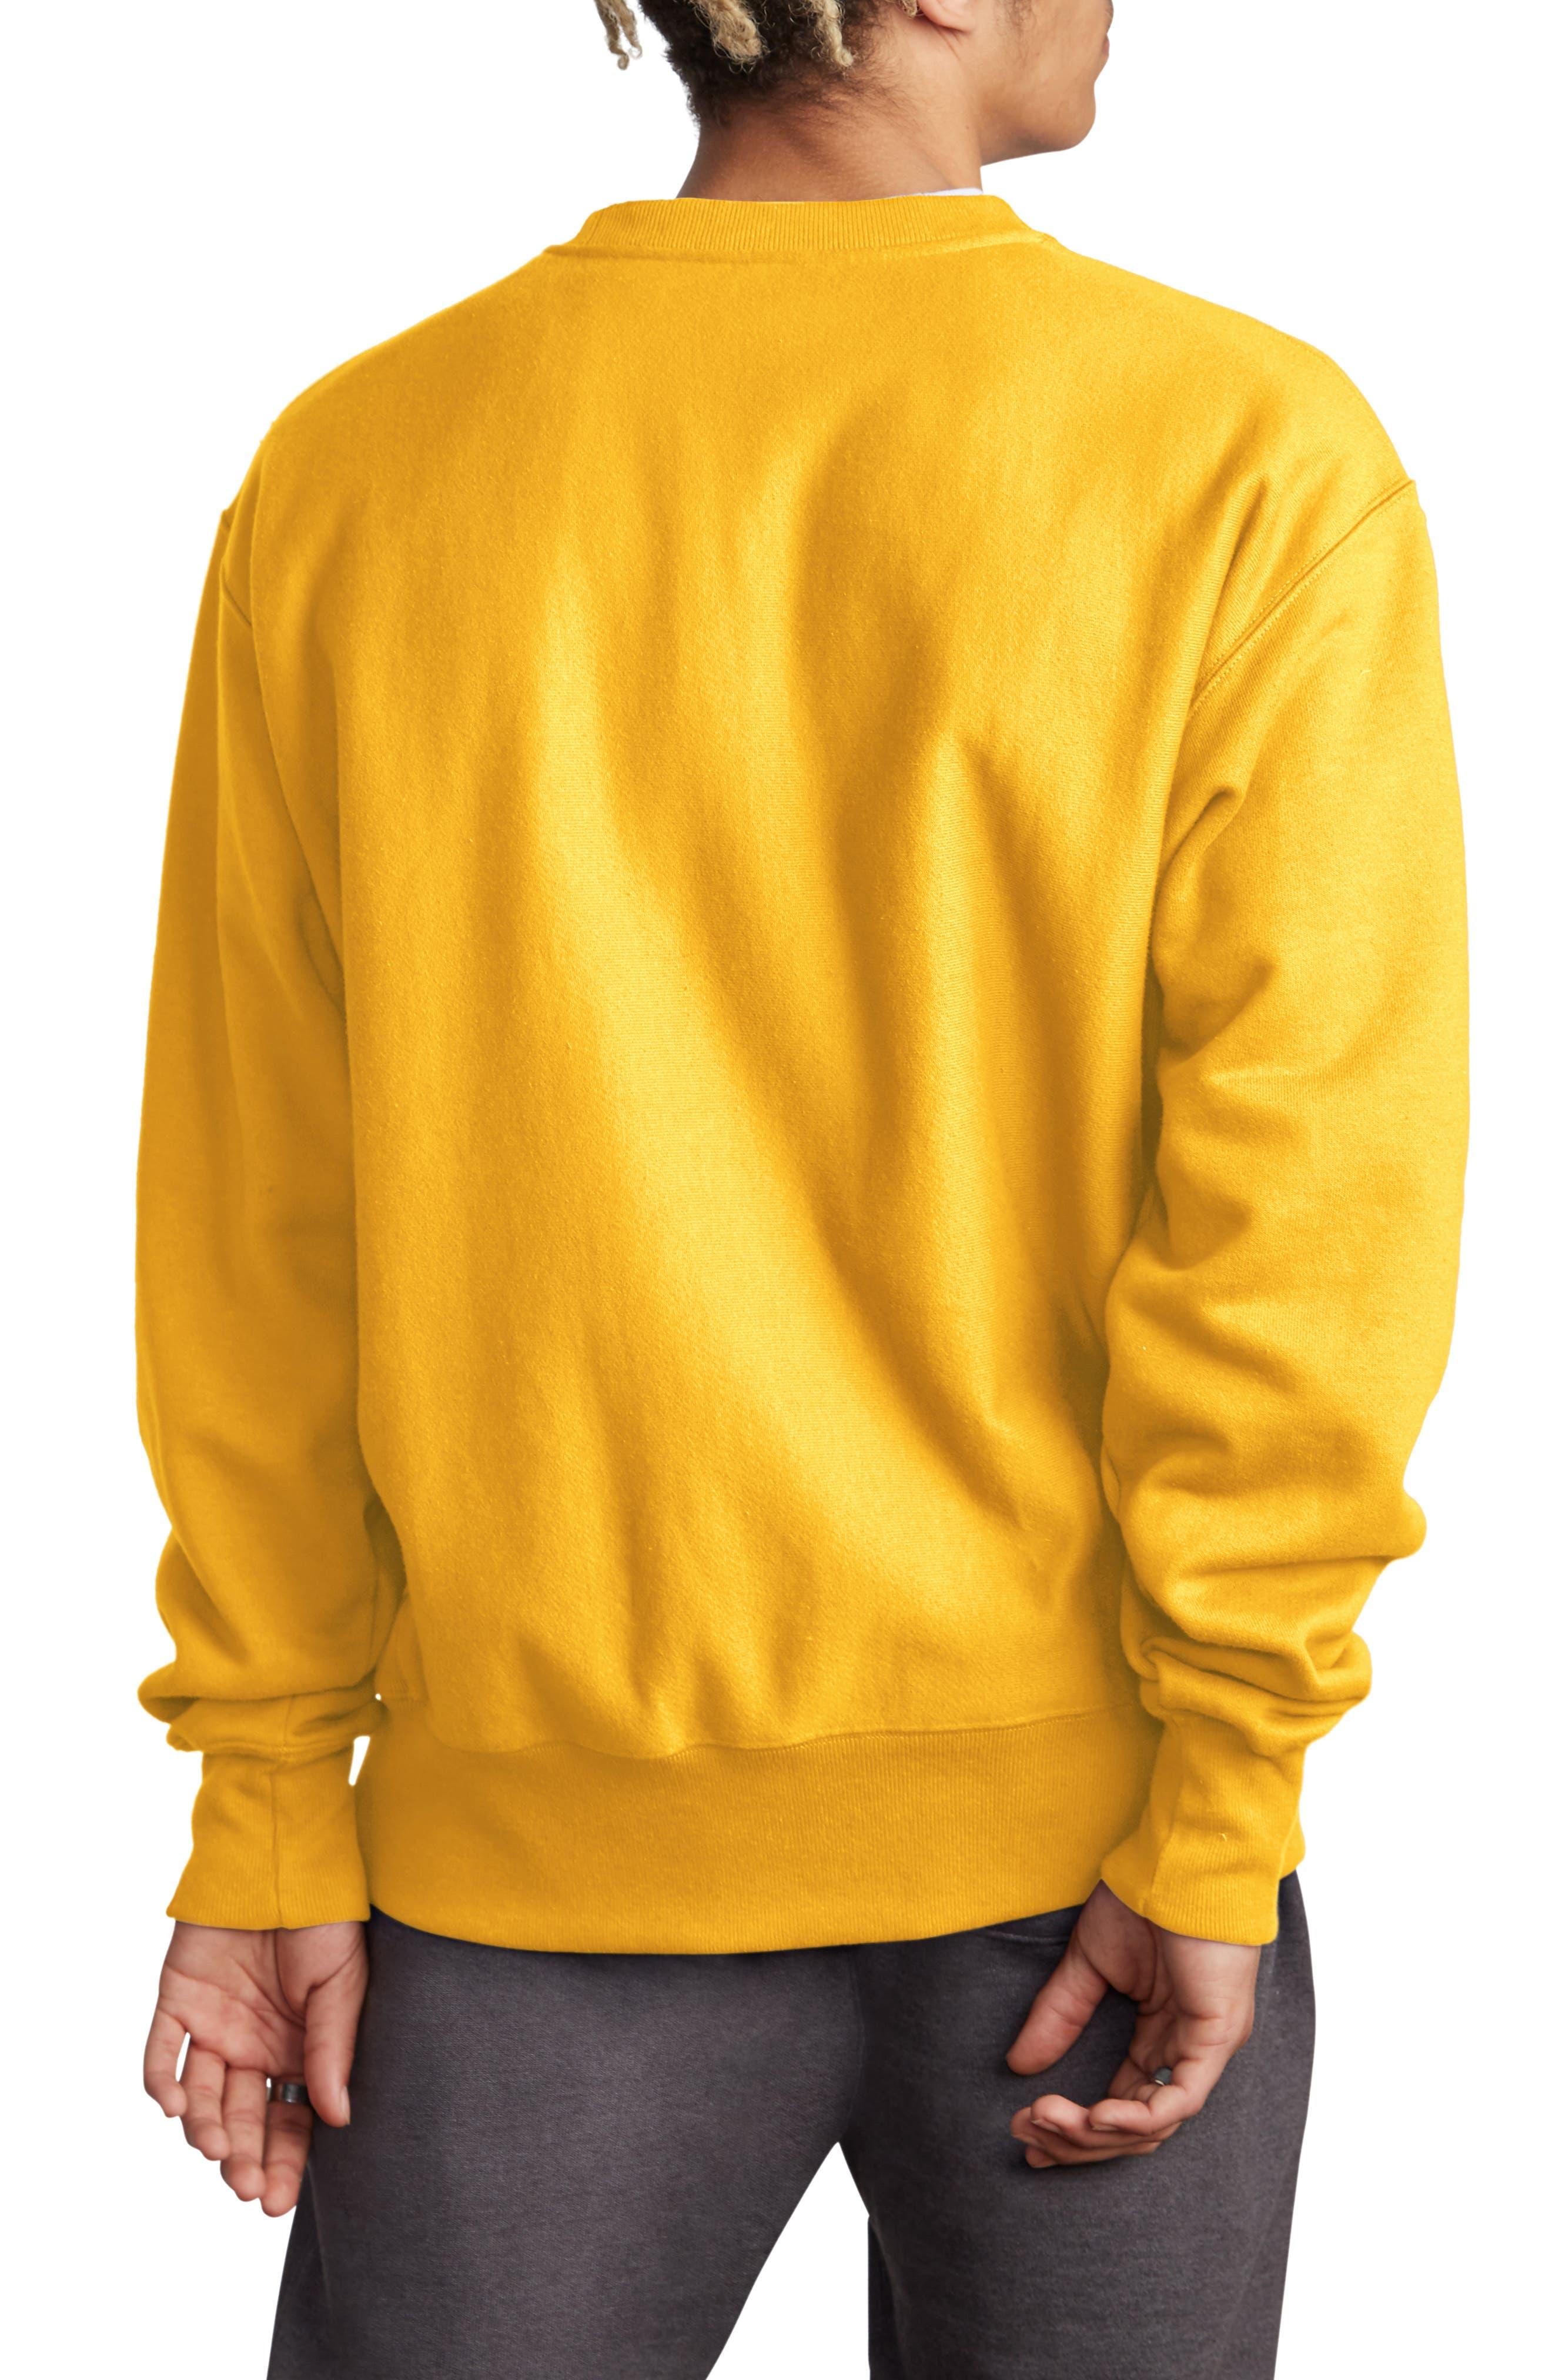 Sublimated Logo Crewneck Sweatshirt,                             Alternate thumbnail 2, color,                             CHAMPION GOLD